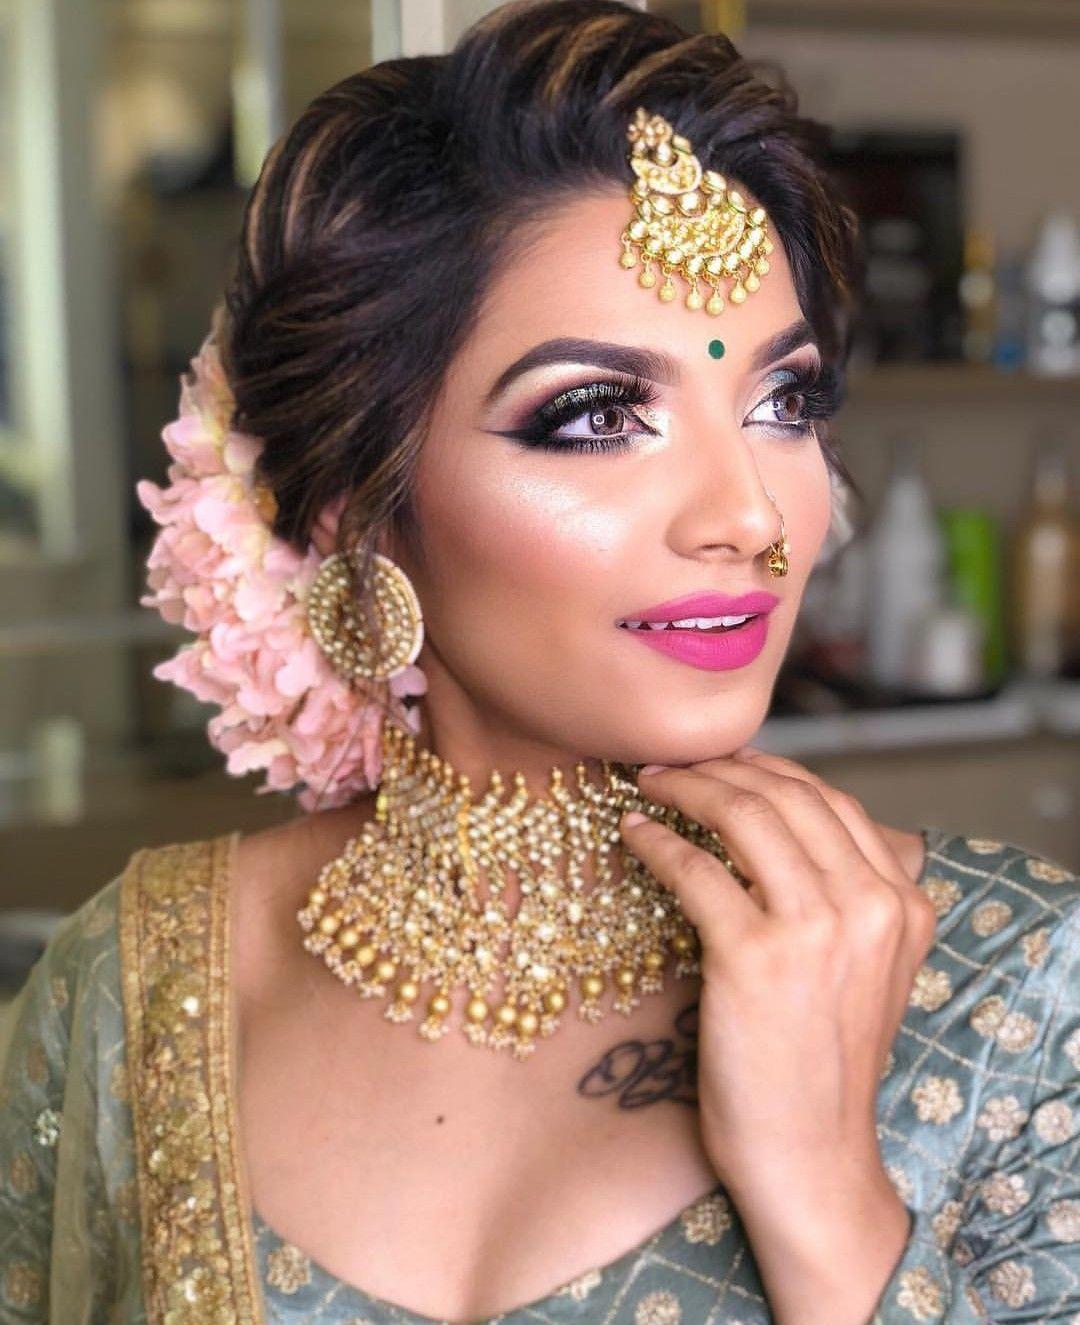 Shikachand Bridaljewelrypunjabi Engagement Hairstyles Hairdo Wedding Indian Bridal Hairstyles